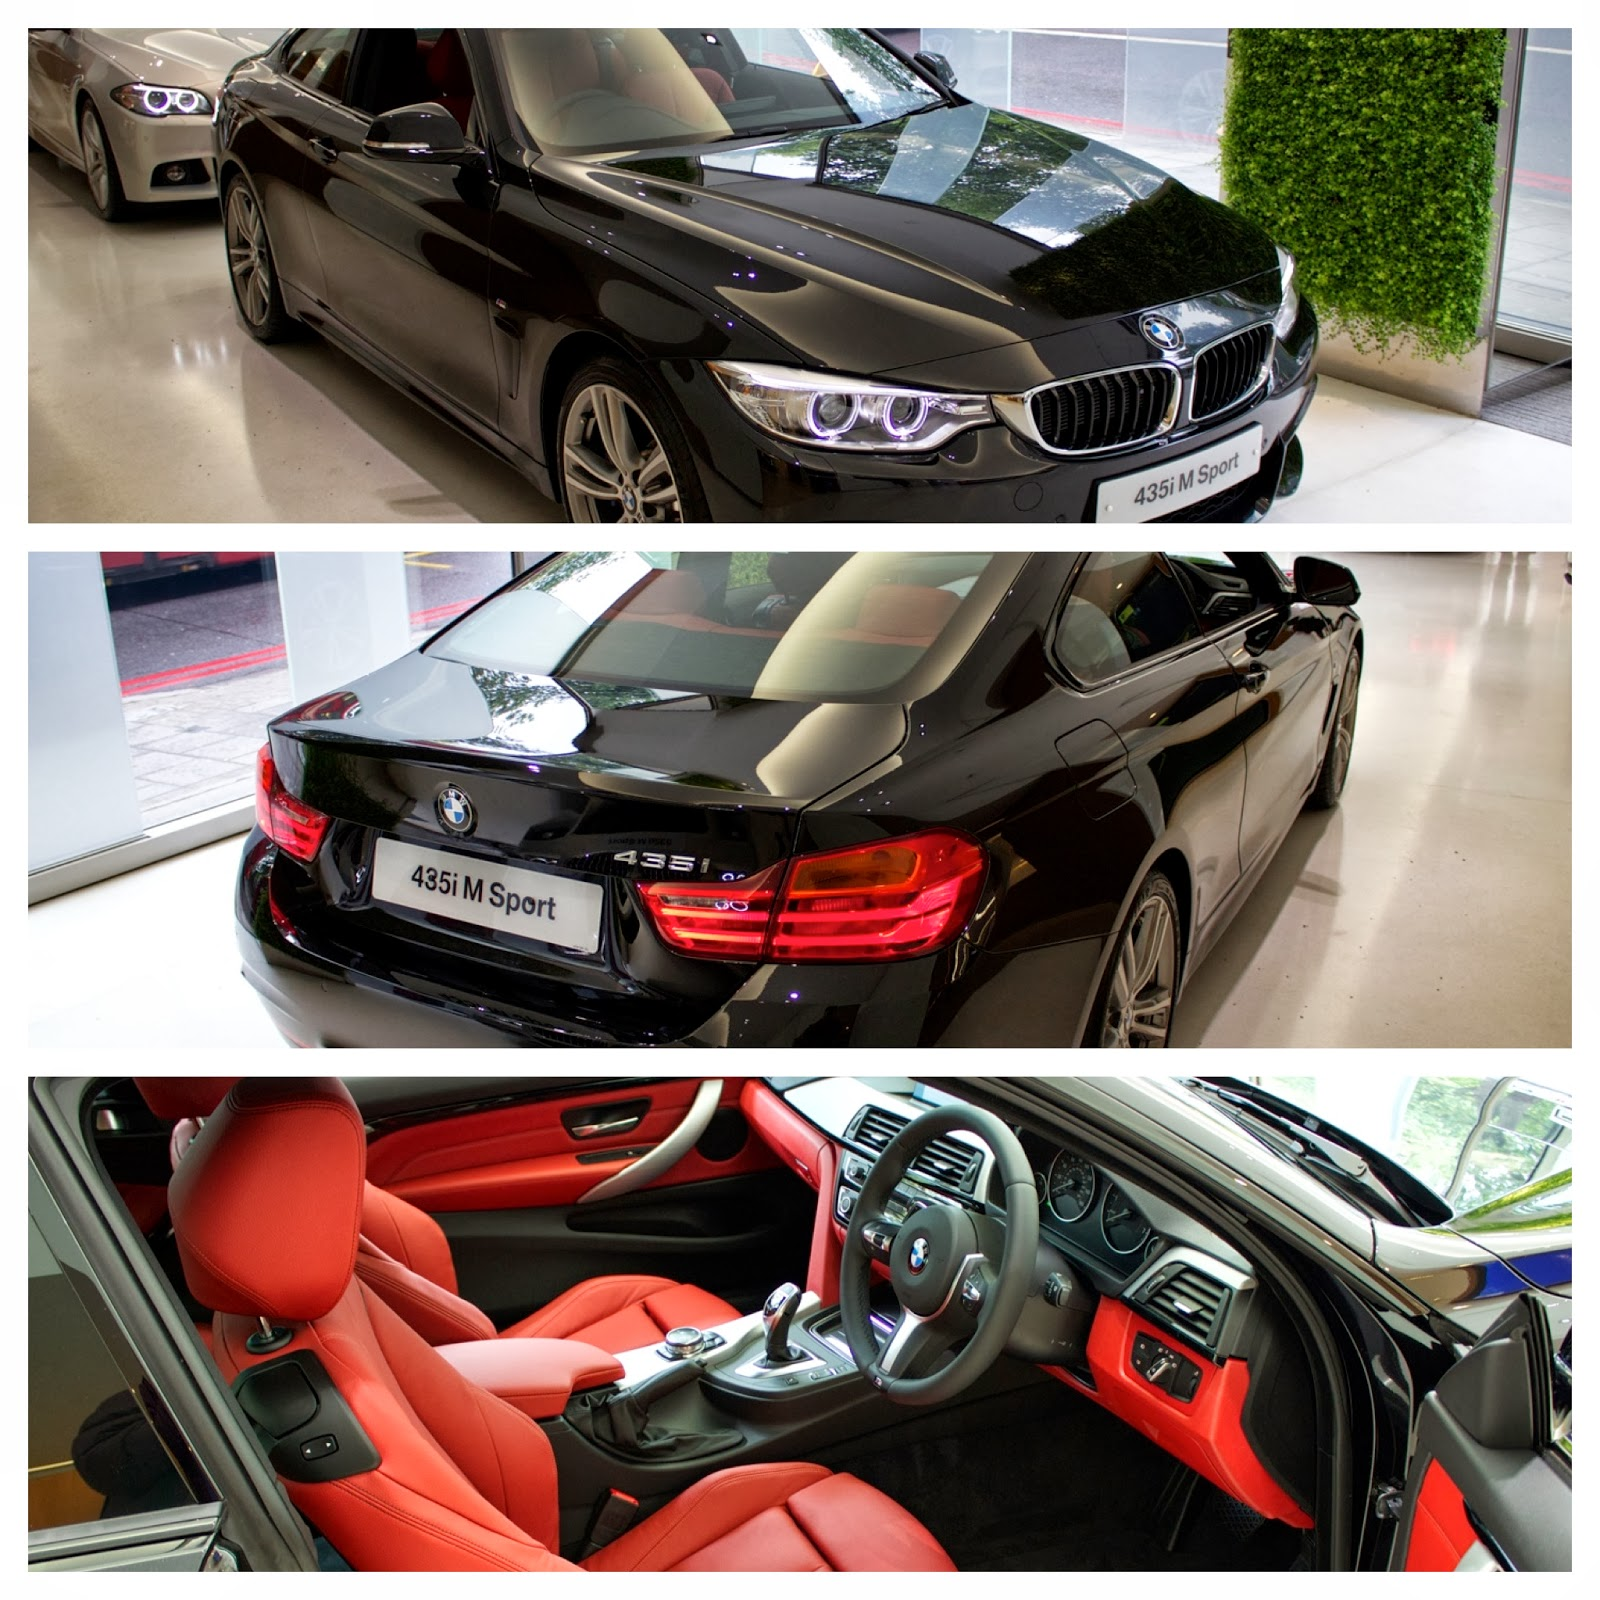 New BMW 435i M Sport - Cars & Life